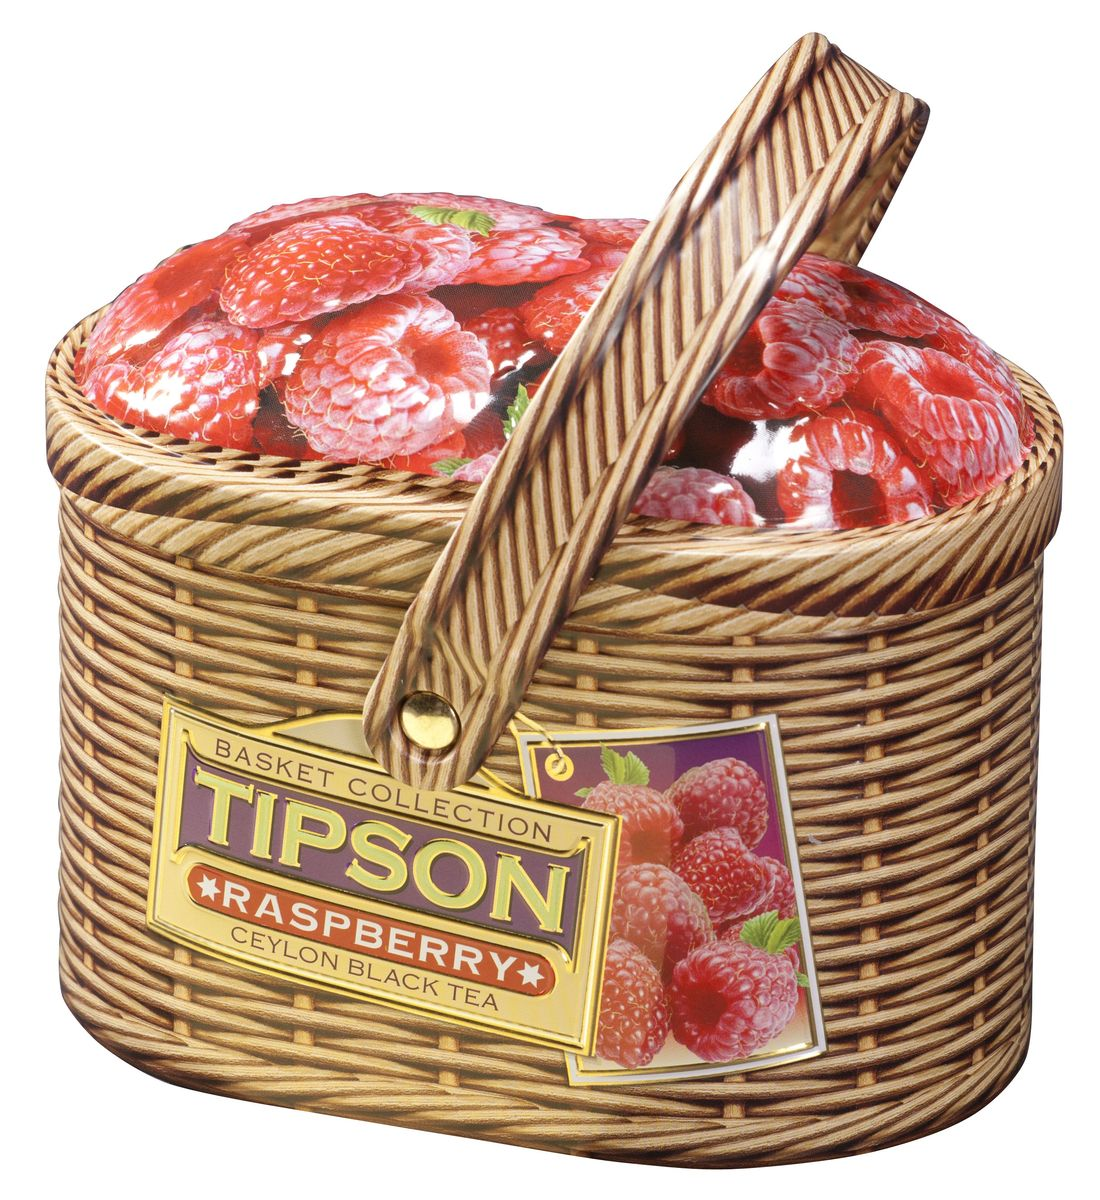 Tipson Raspberry черный листовой чай, 100 г (жестяная банка) mabroc эрл грей чай черный листовой 100 г